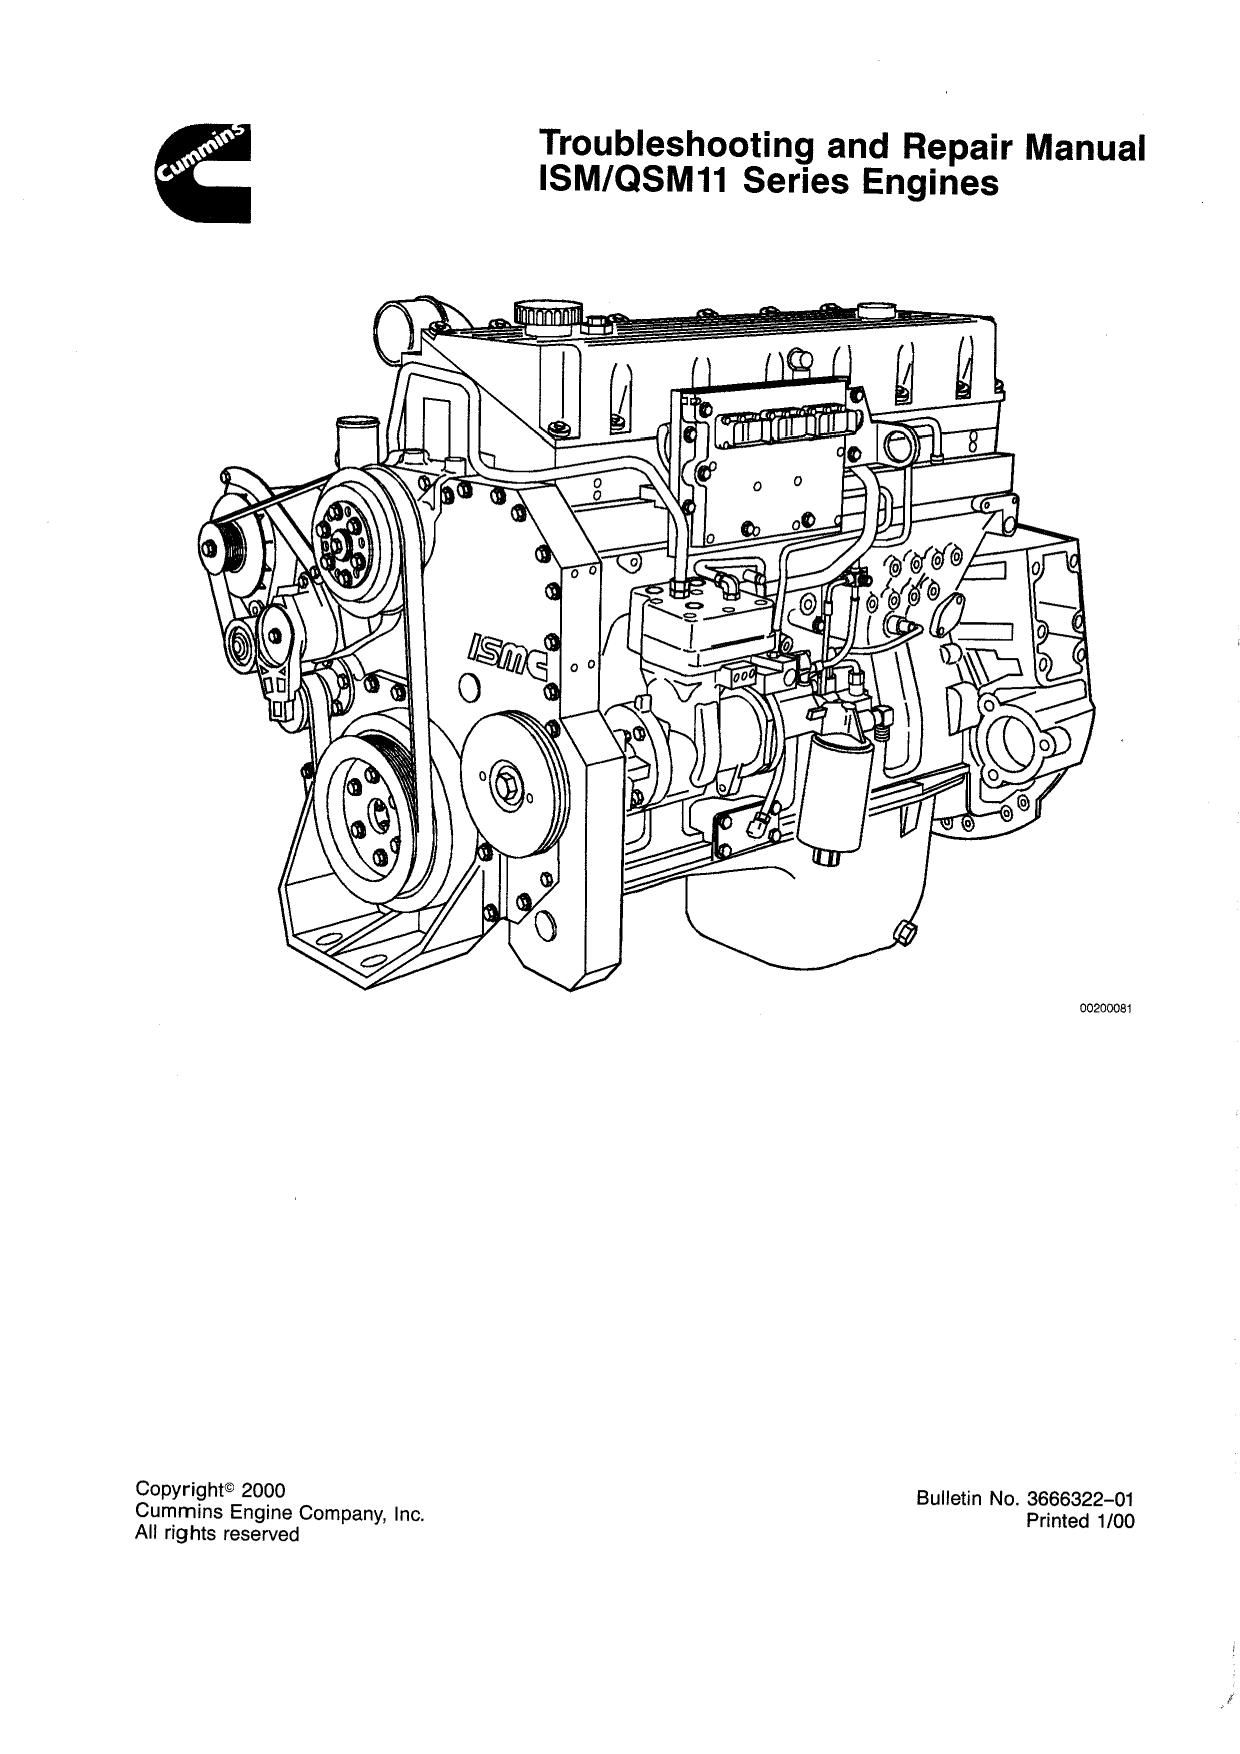 Cummins inc - сервисная документая для двигателя cummins qsm11 2007-2016 г, pdf/djvu, rus